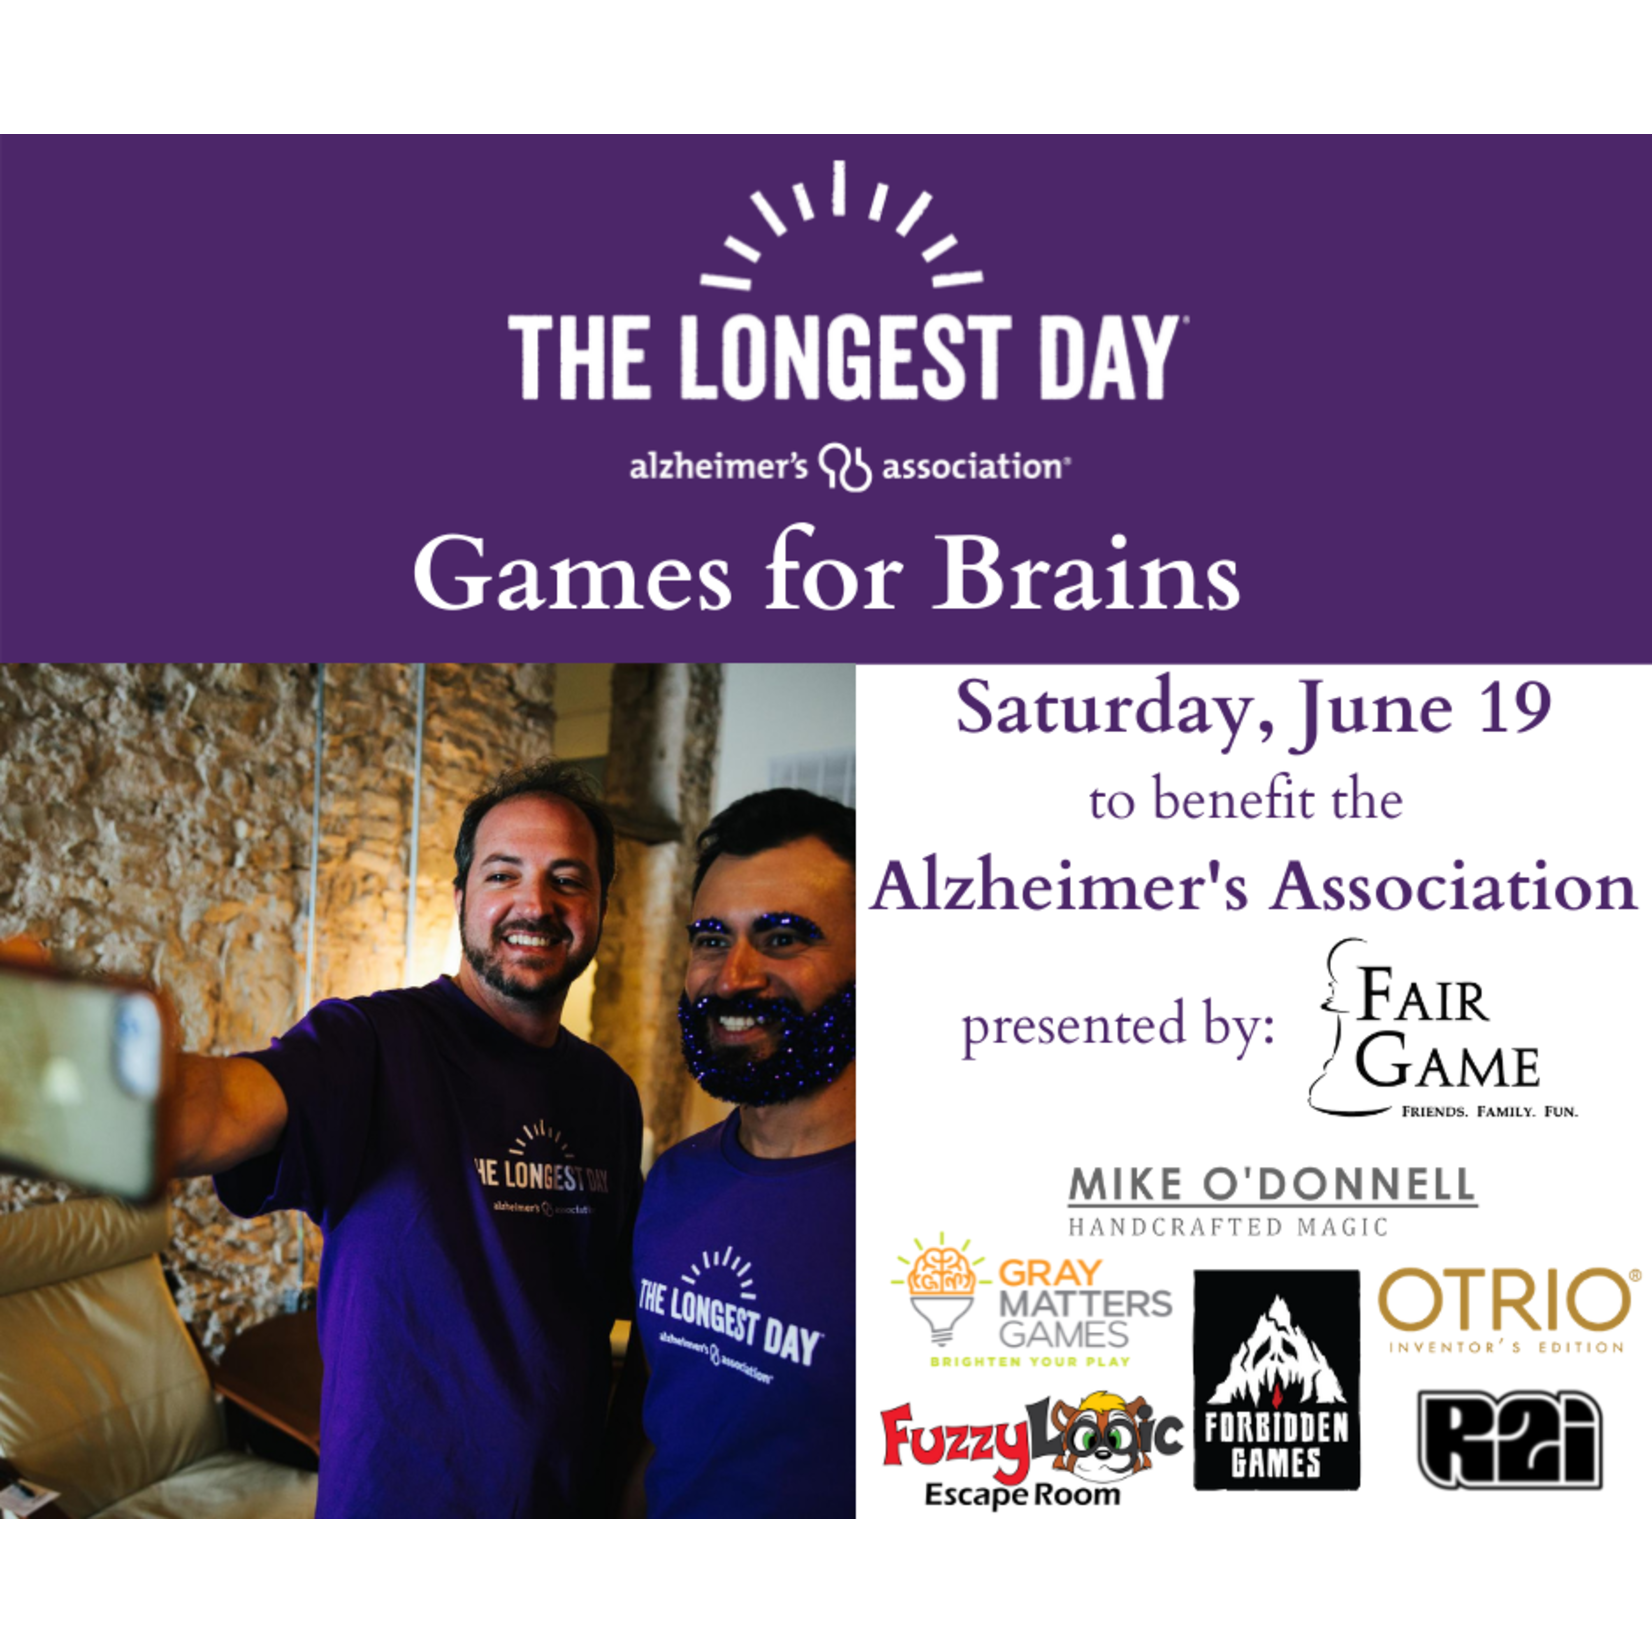 Games for Brains: Magic Show (5 - 5:30 PM)